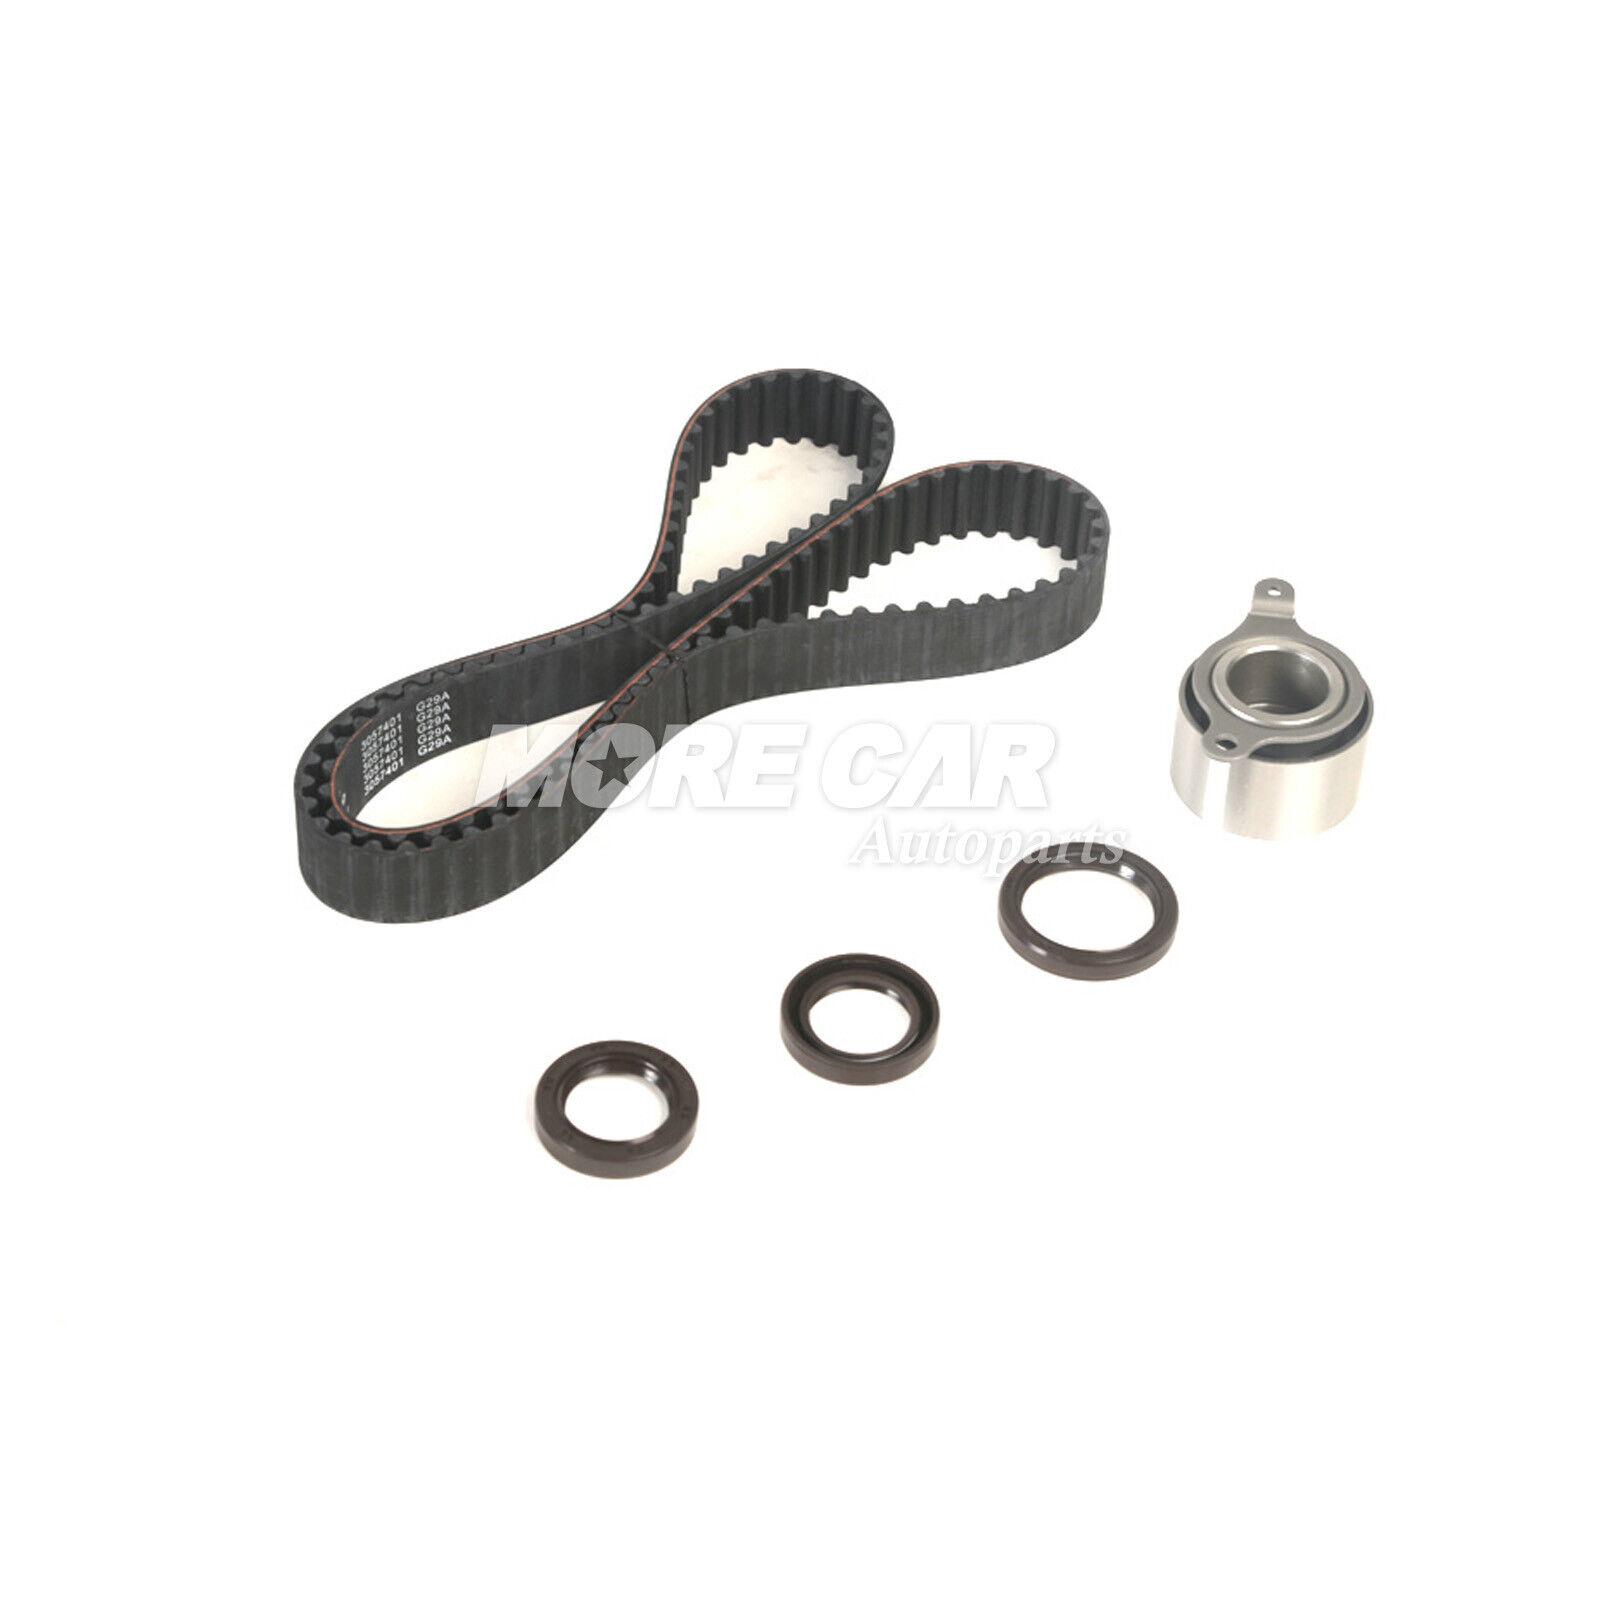 Timing Belt Kit Fit 92-00 Acura Integra Honda 1.6L 1.7L